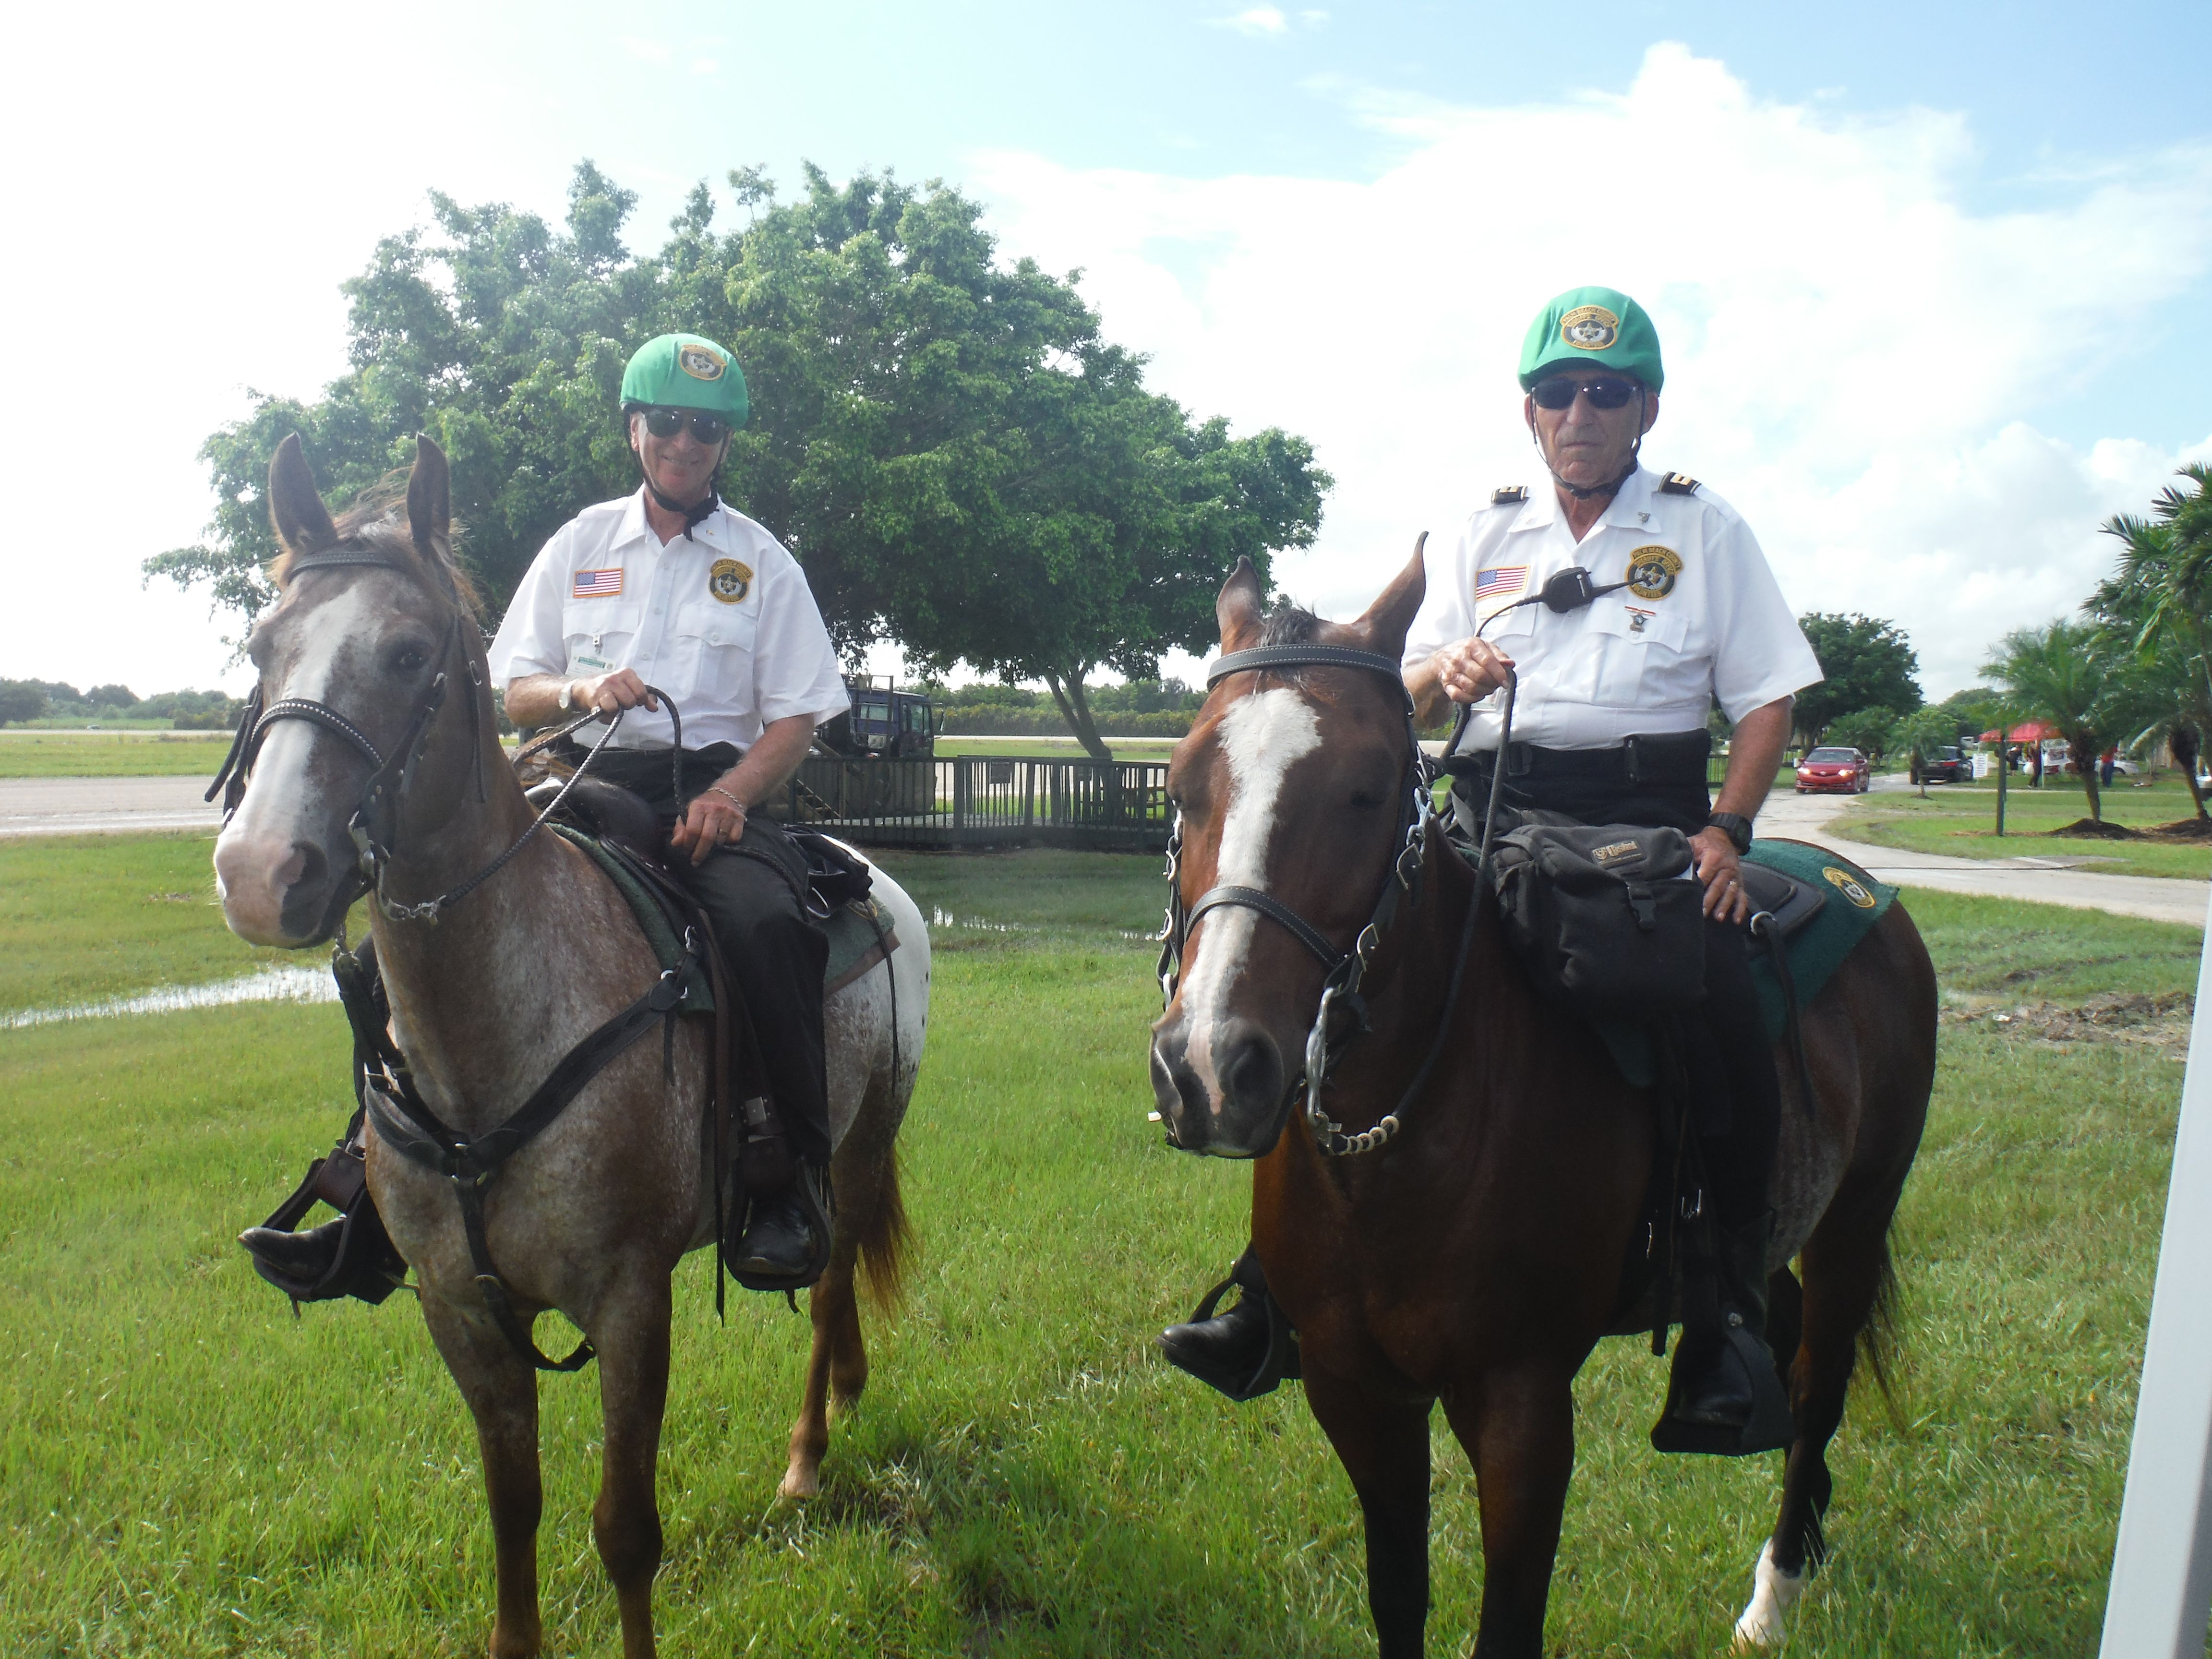 Equestrian Flea Market & Harness Racing